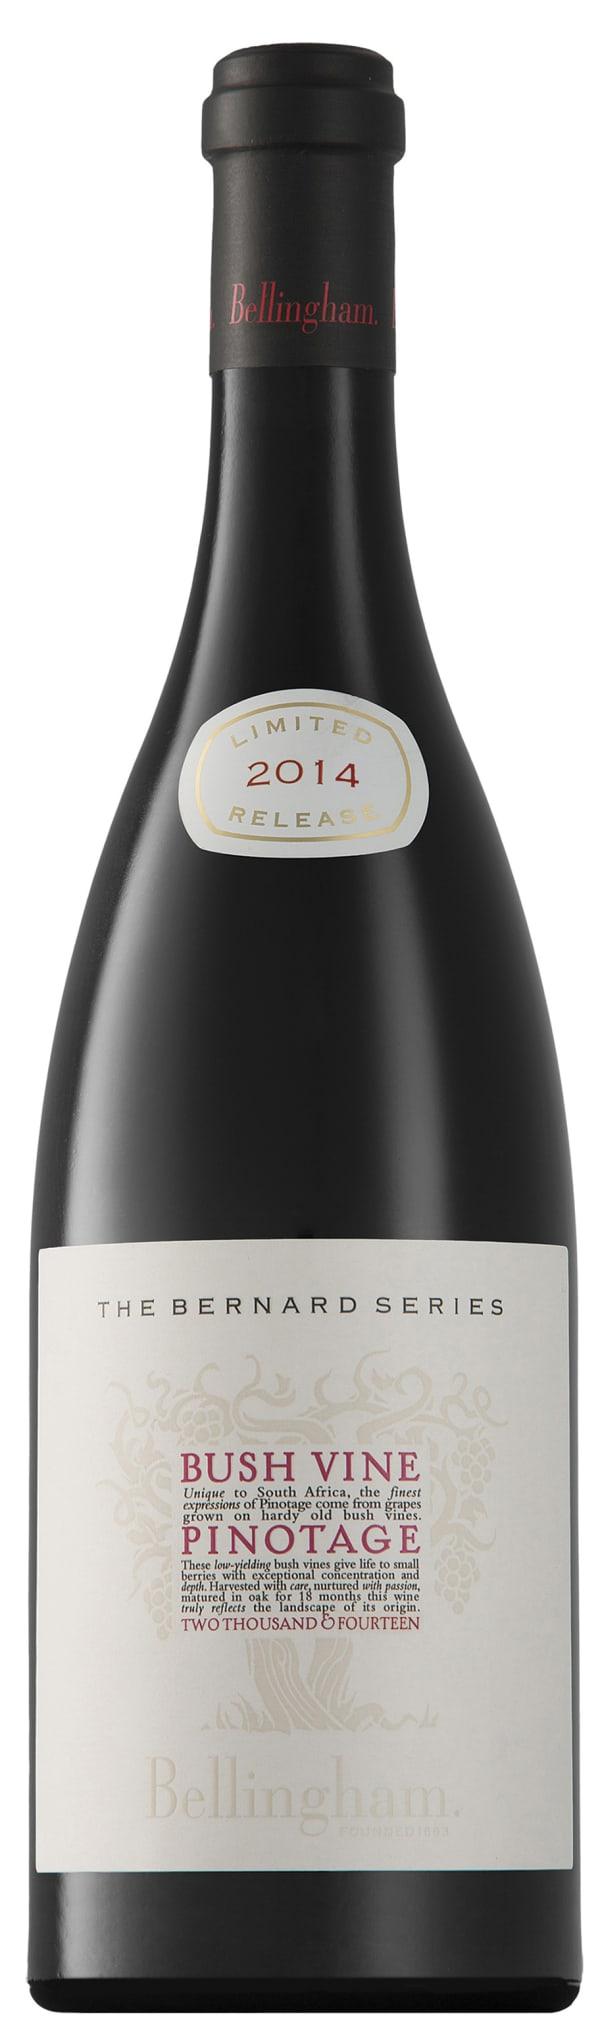 Bellingham The Bernard Series Bush Vine Pinotage 2014